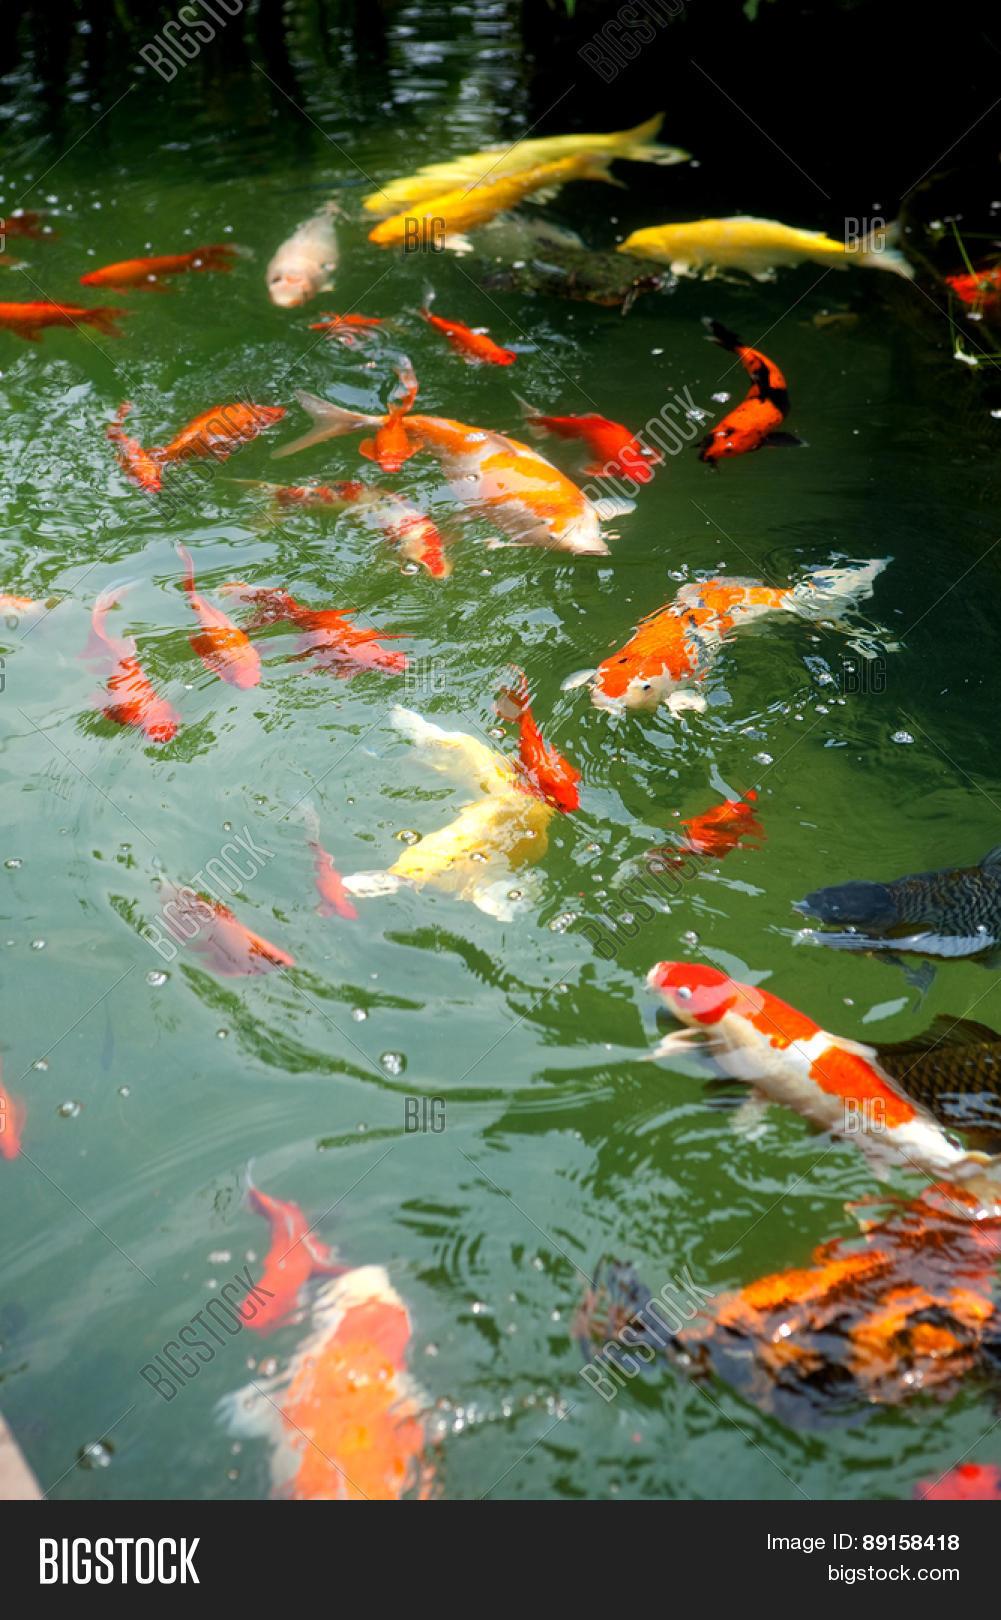 Beautiful ornamental koi fish image photo bigstock for Ornamental fish for pond